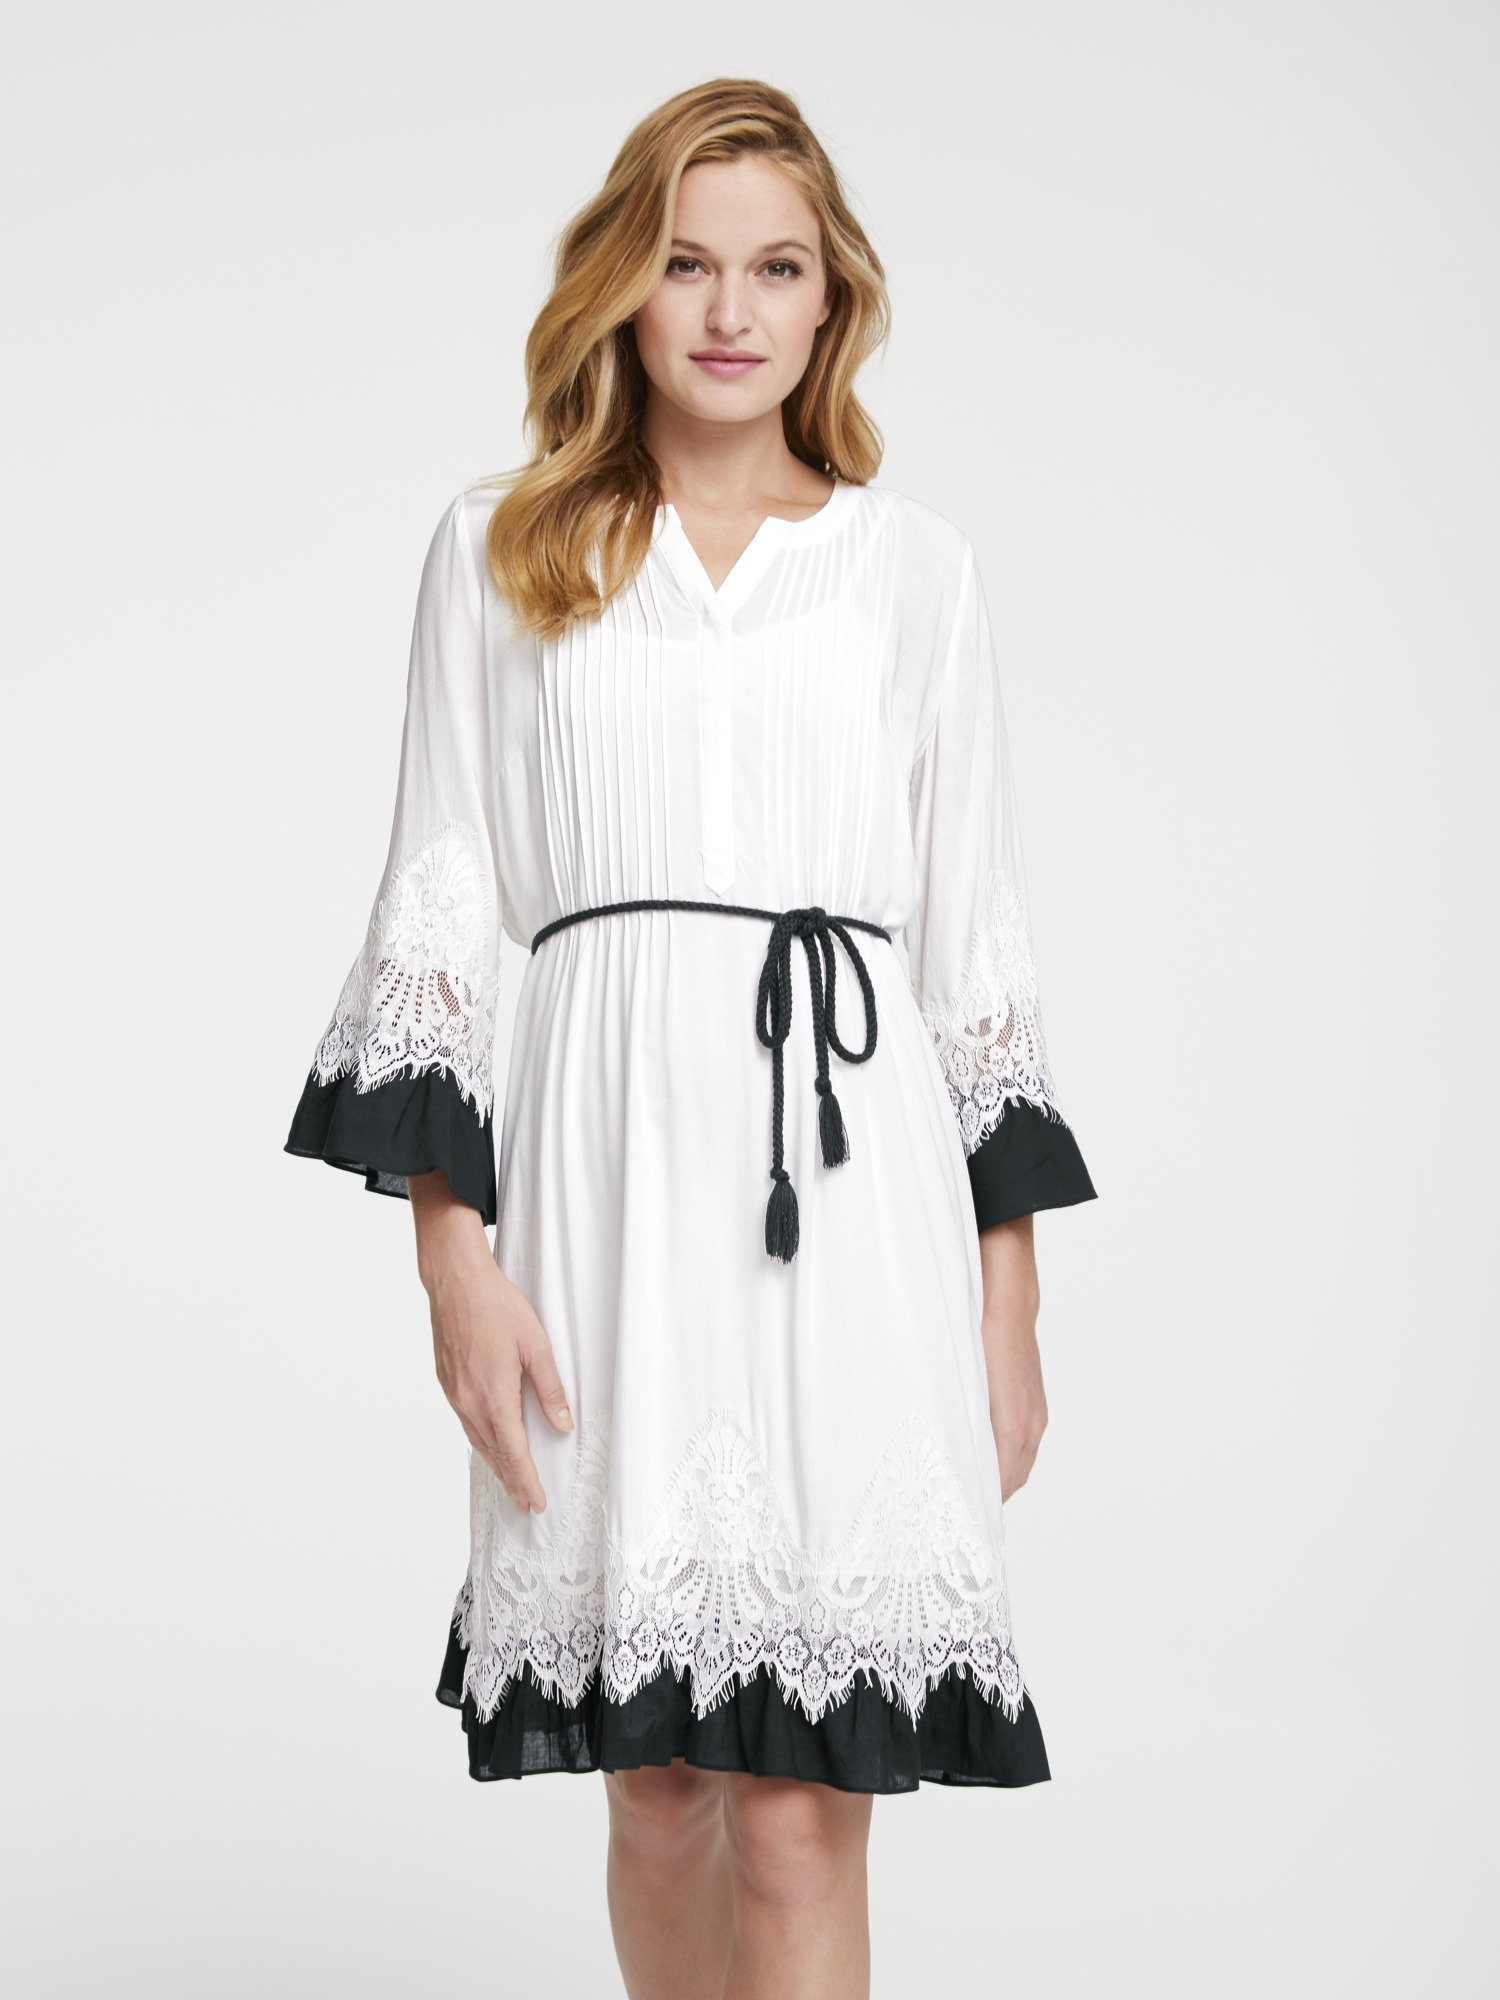 LINEA TESINI by Heine Kanten jurk bestellen: 30 dagen bedenktijd